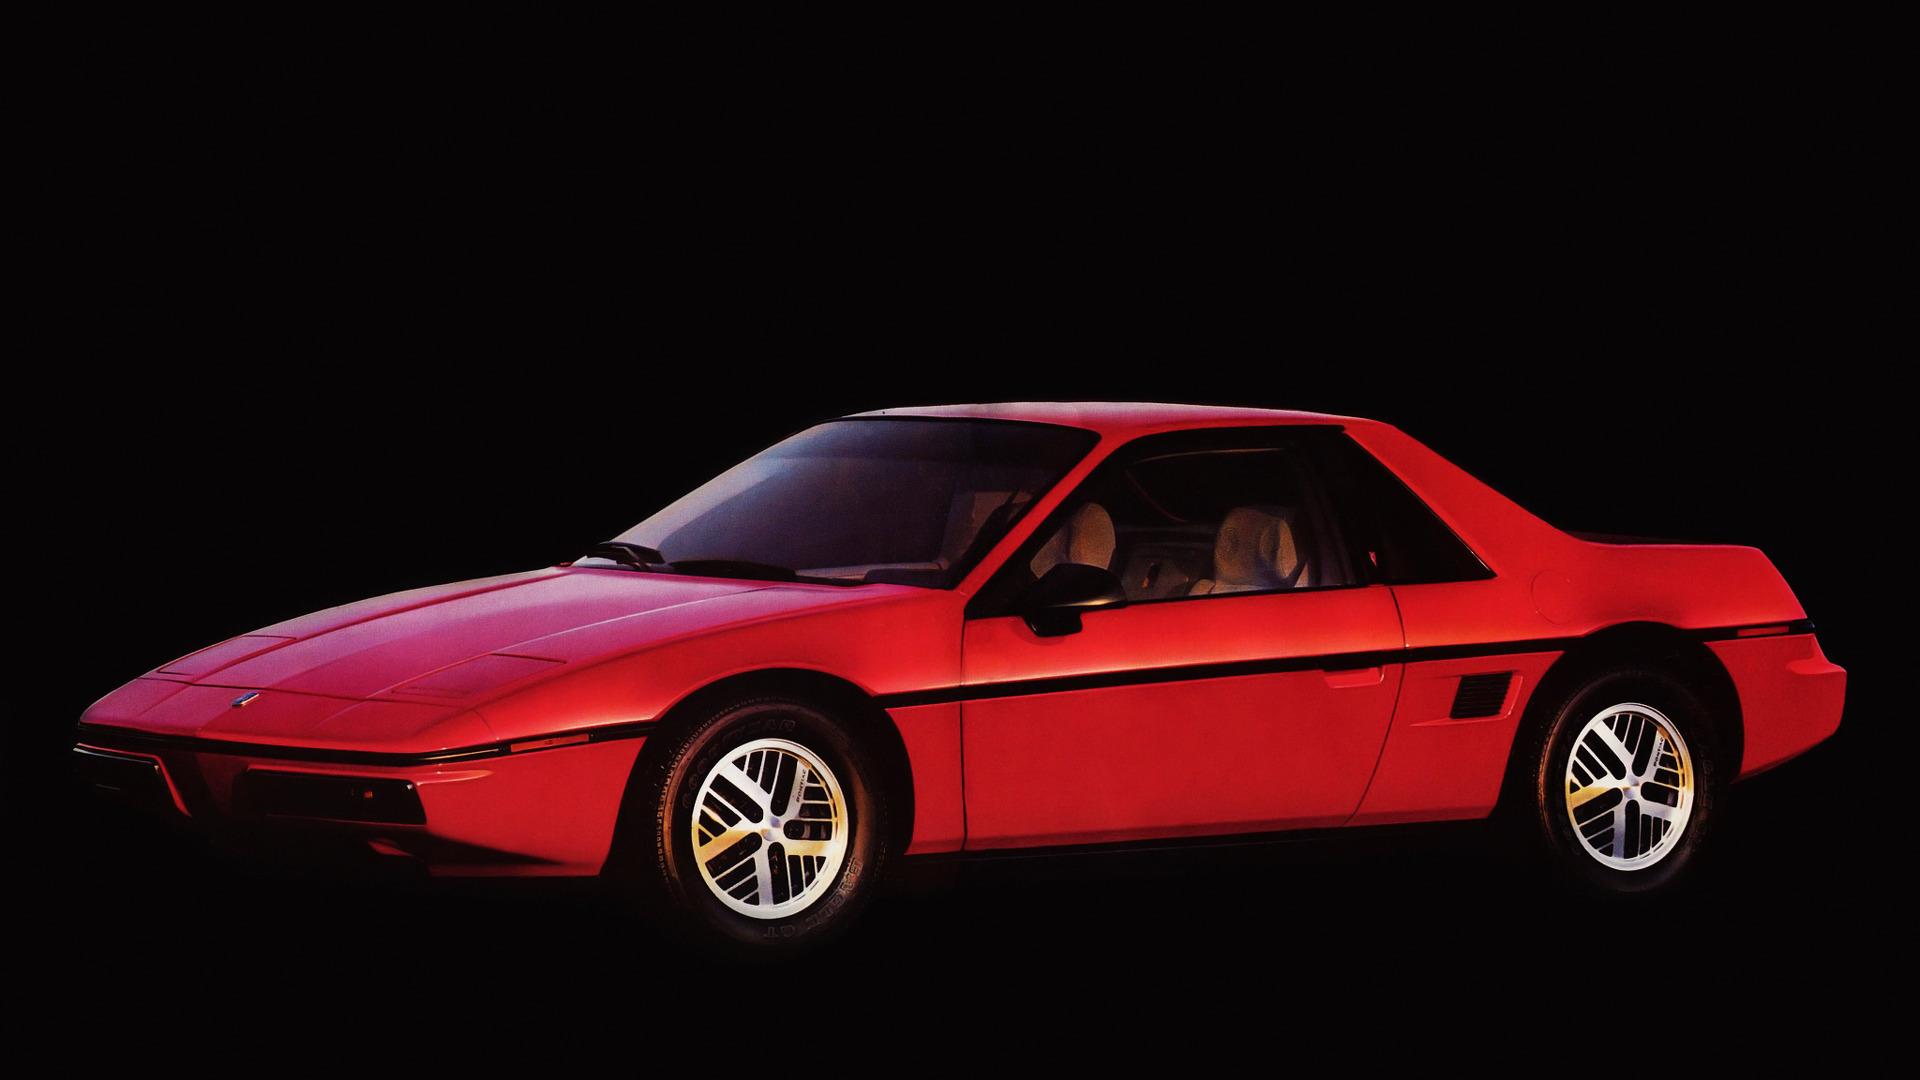 Worst Sports Cars Pontiac Fiero Drawings